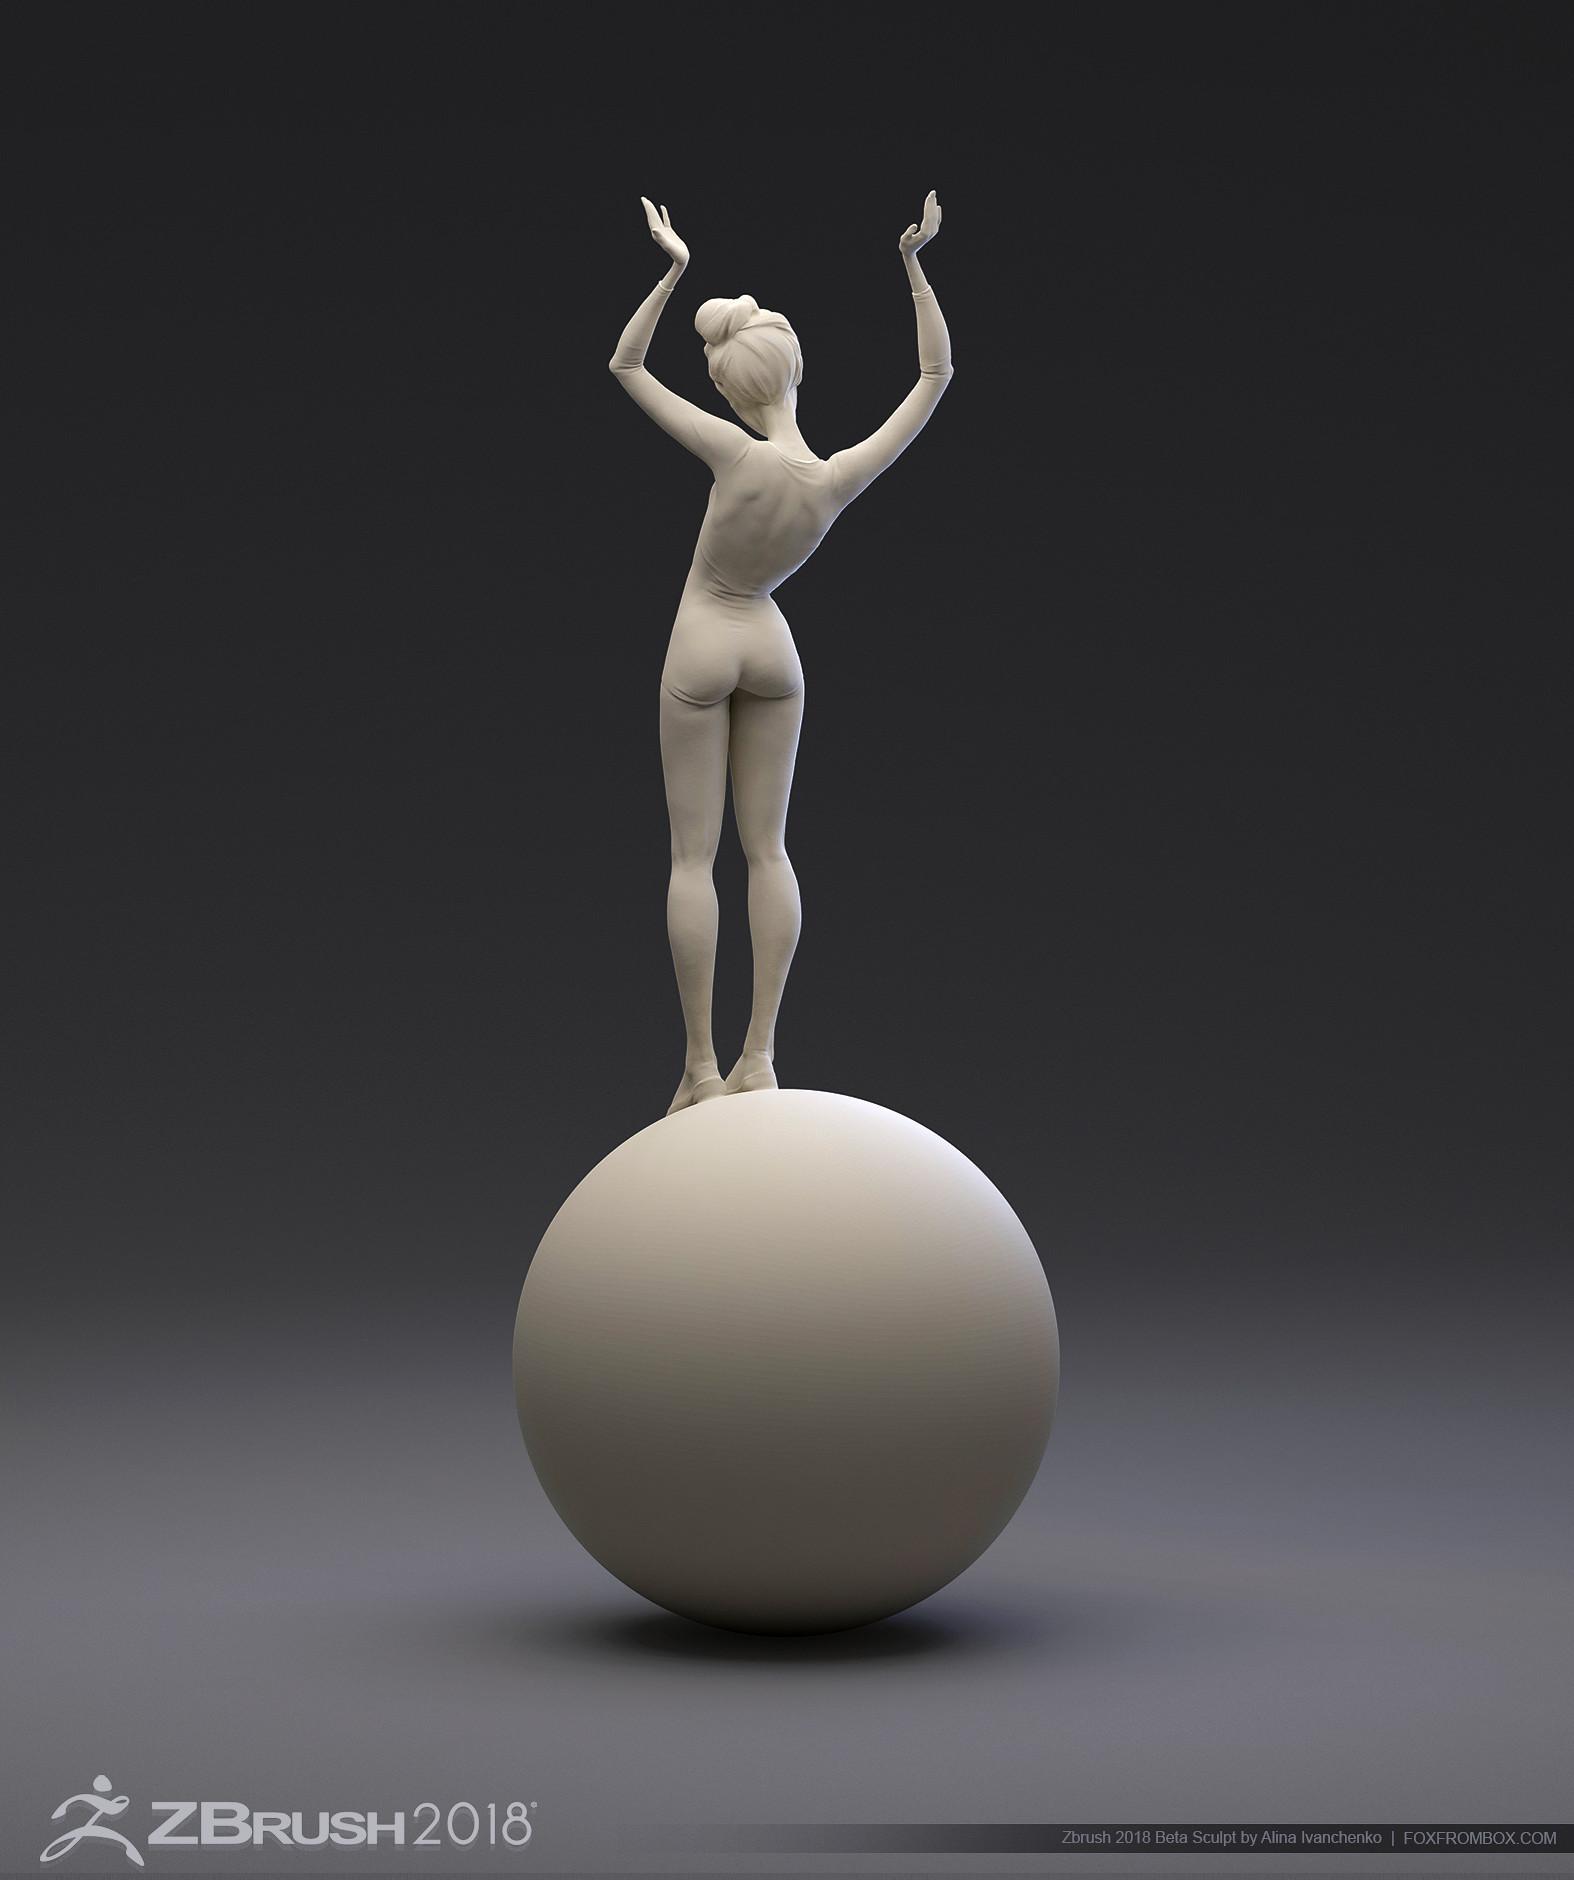 Alina ivanchenko shere sculpt keyshot03